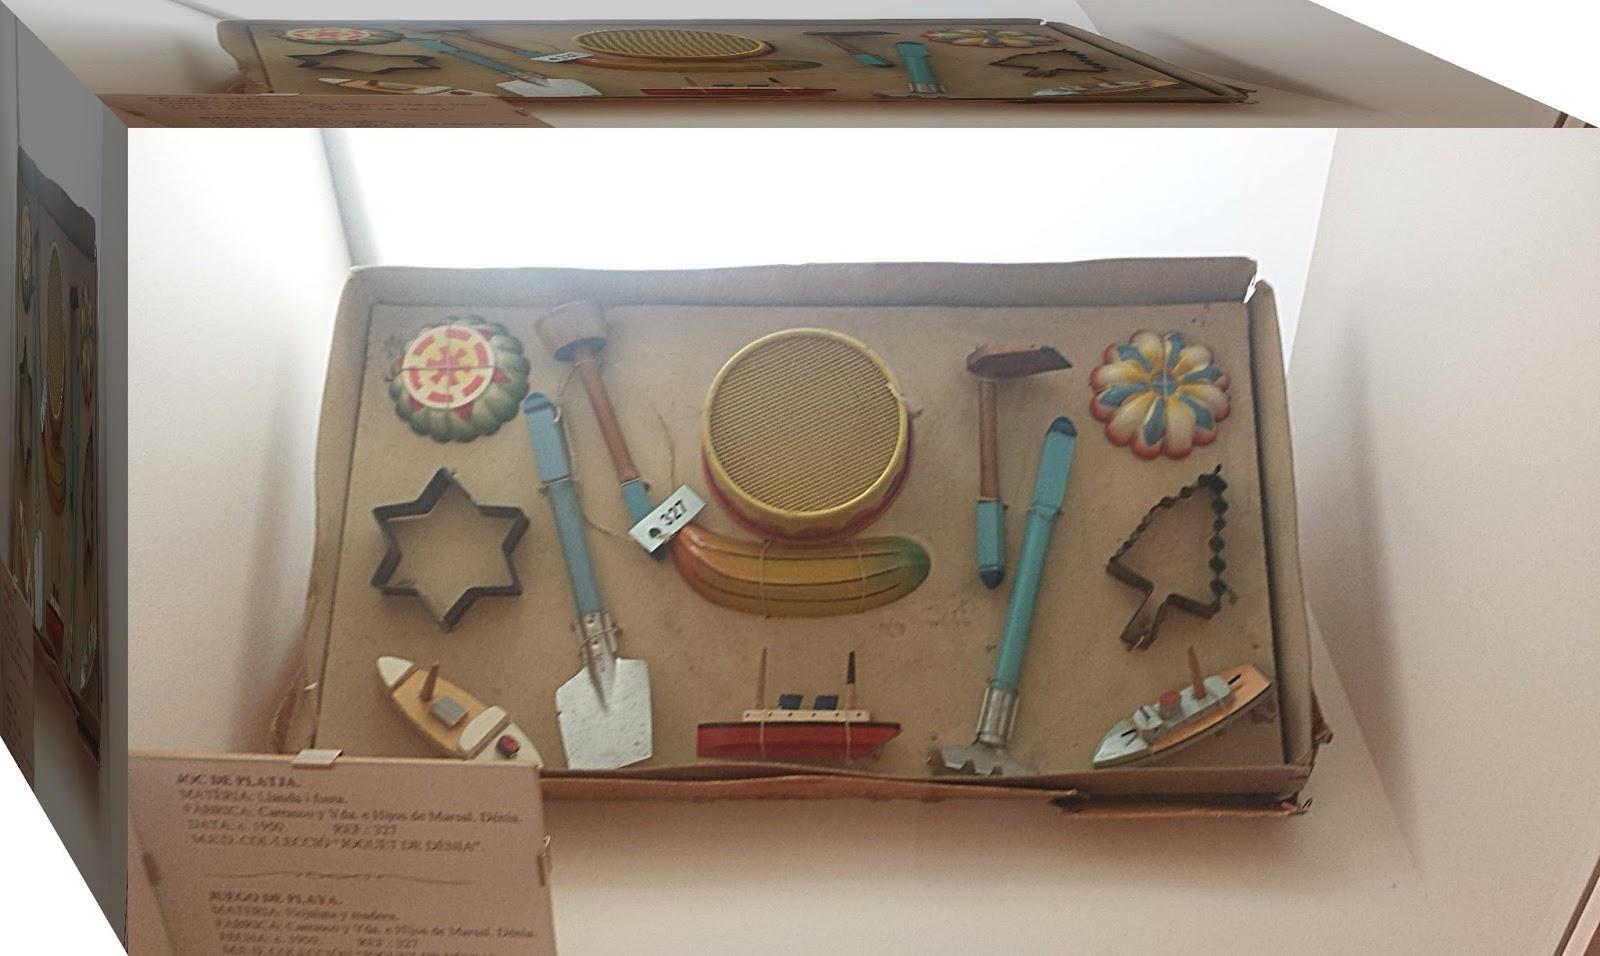 Rin tin tin y juguetes antiguos antiguos juguetes de - Juguetes antiguos de madera ...